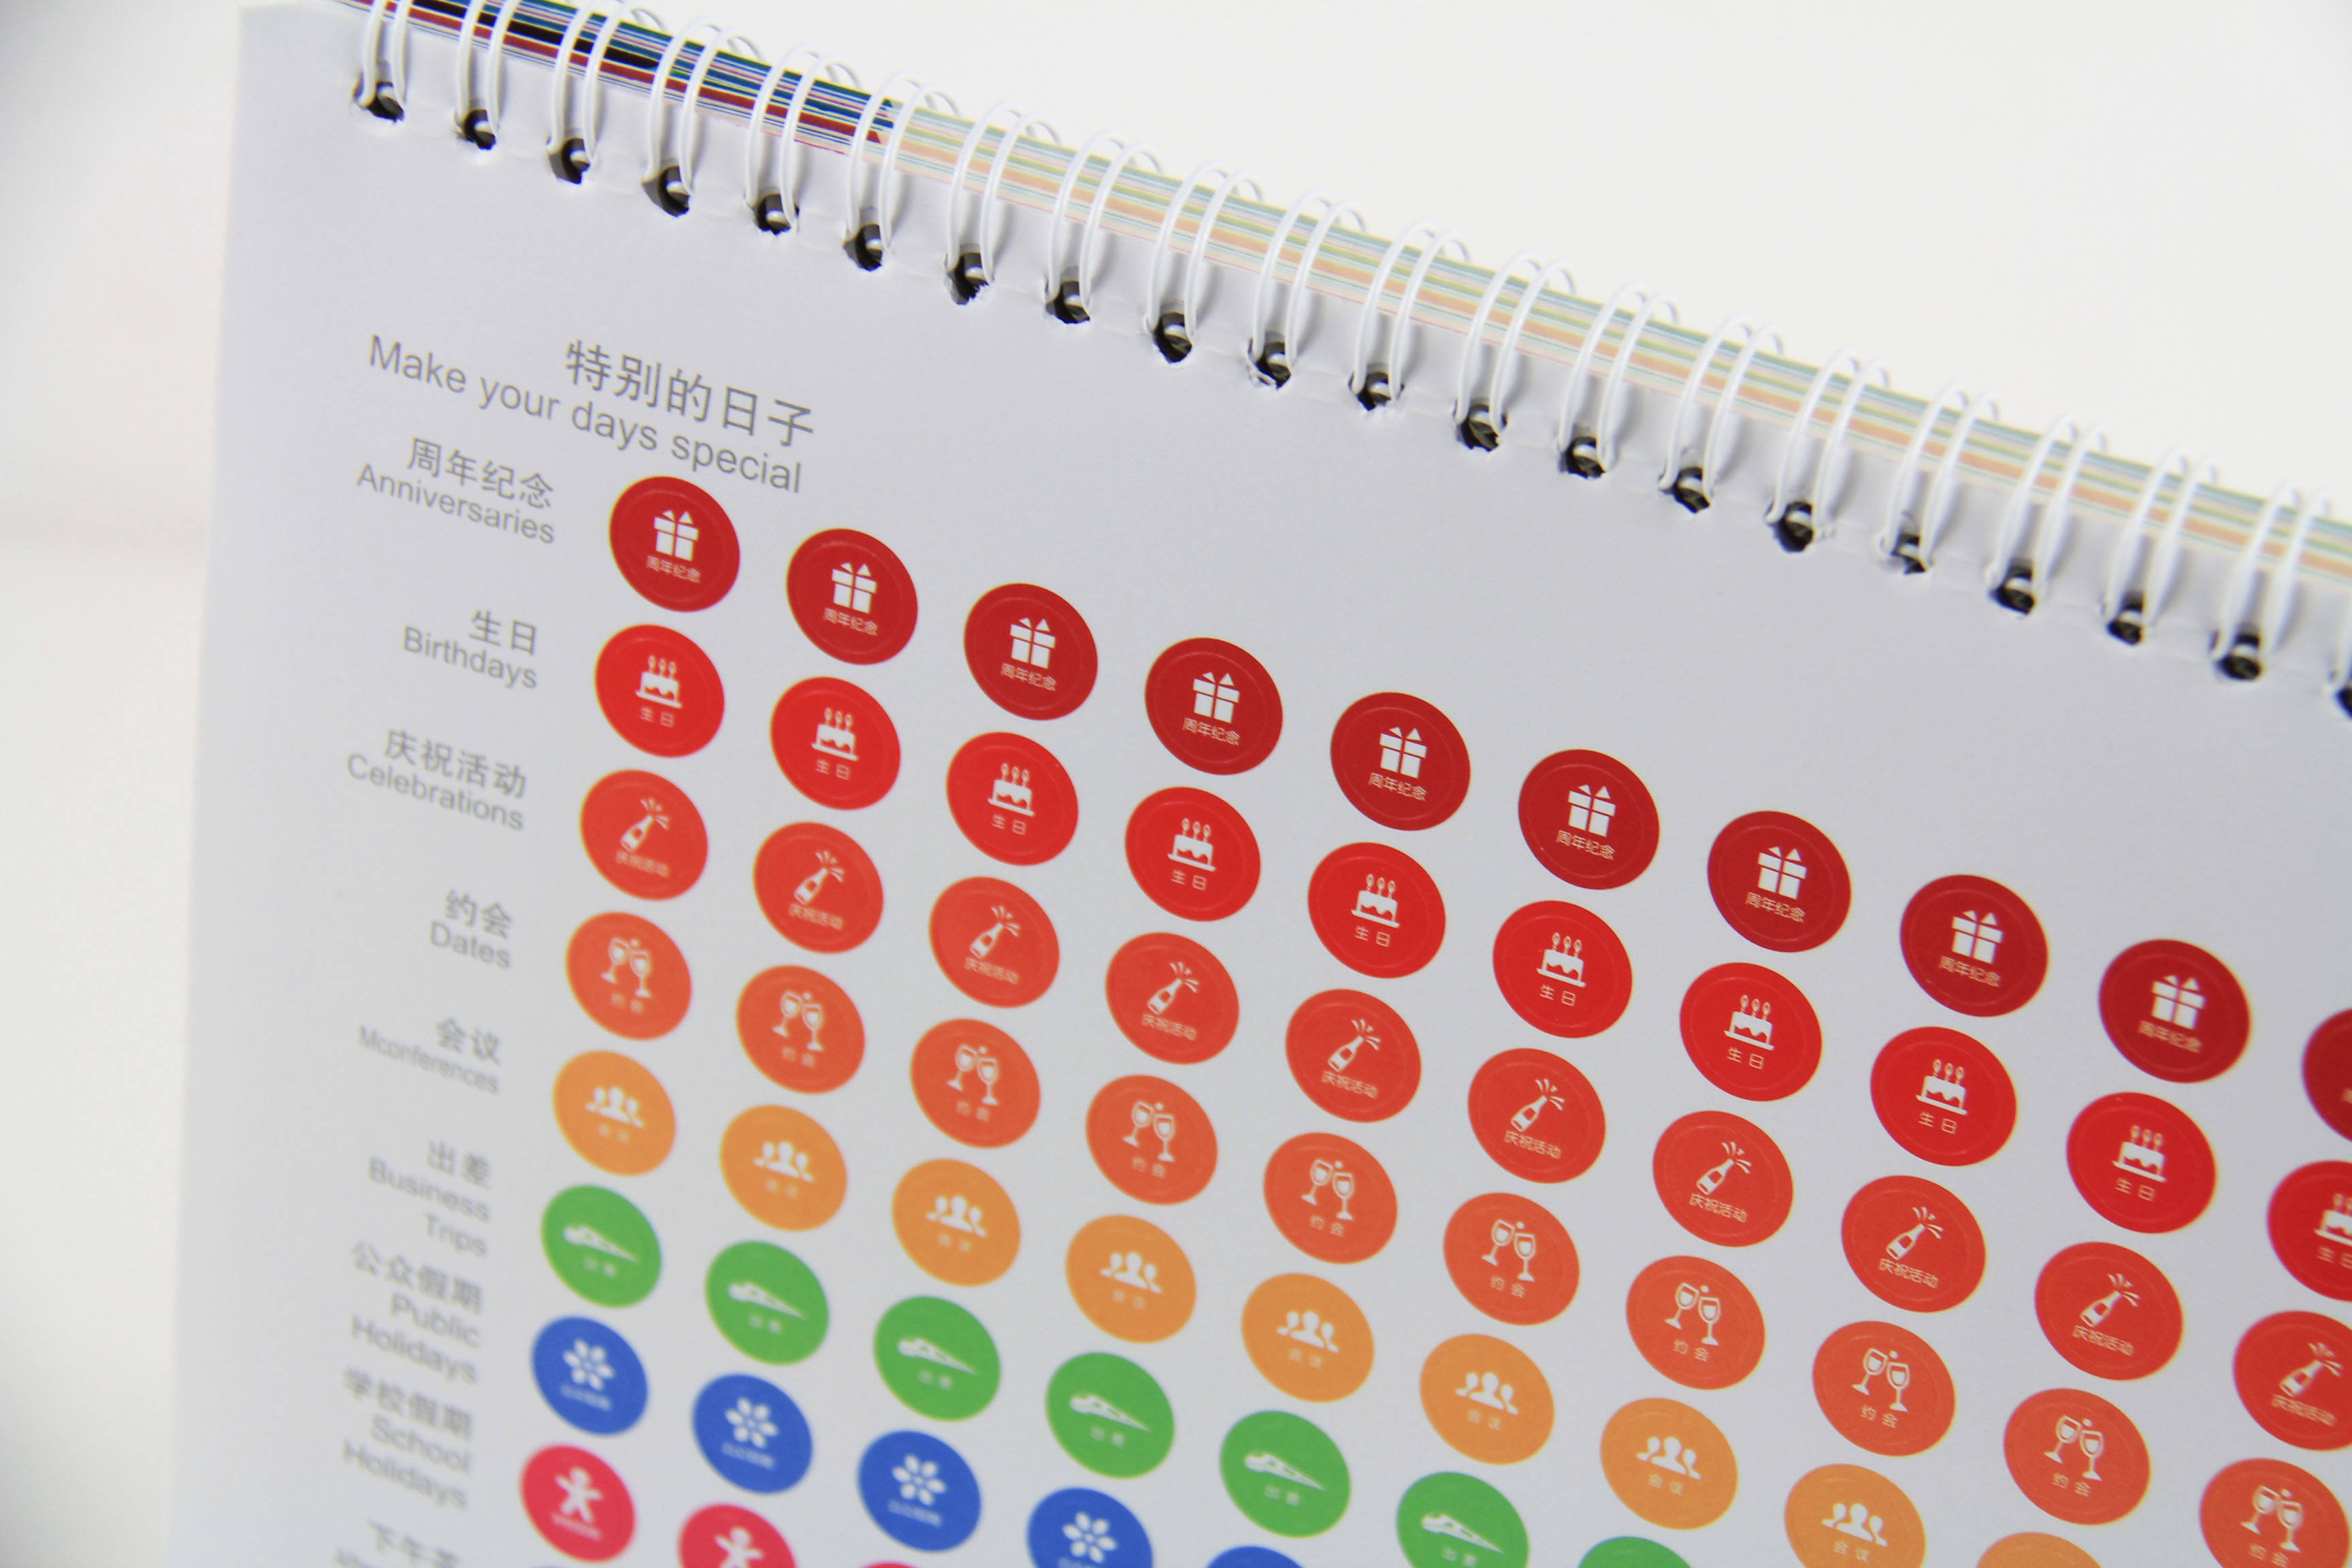 календарь без цифр фото собой представляют